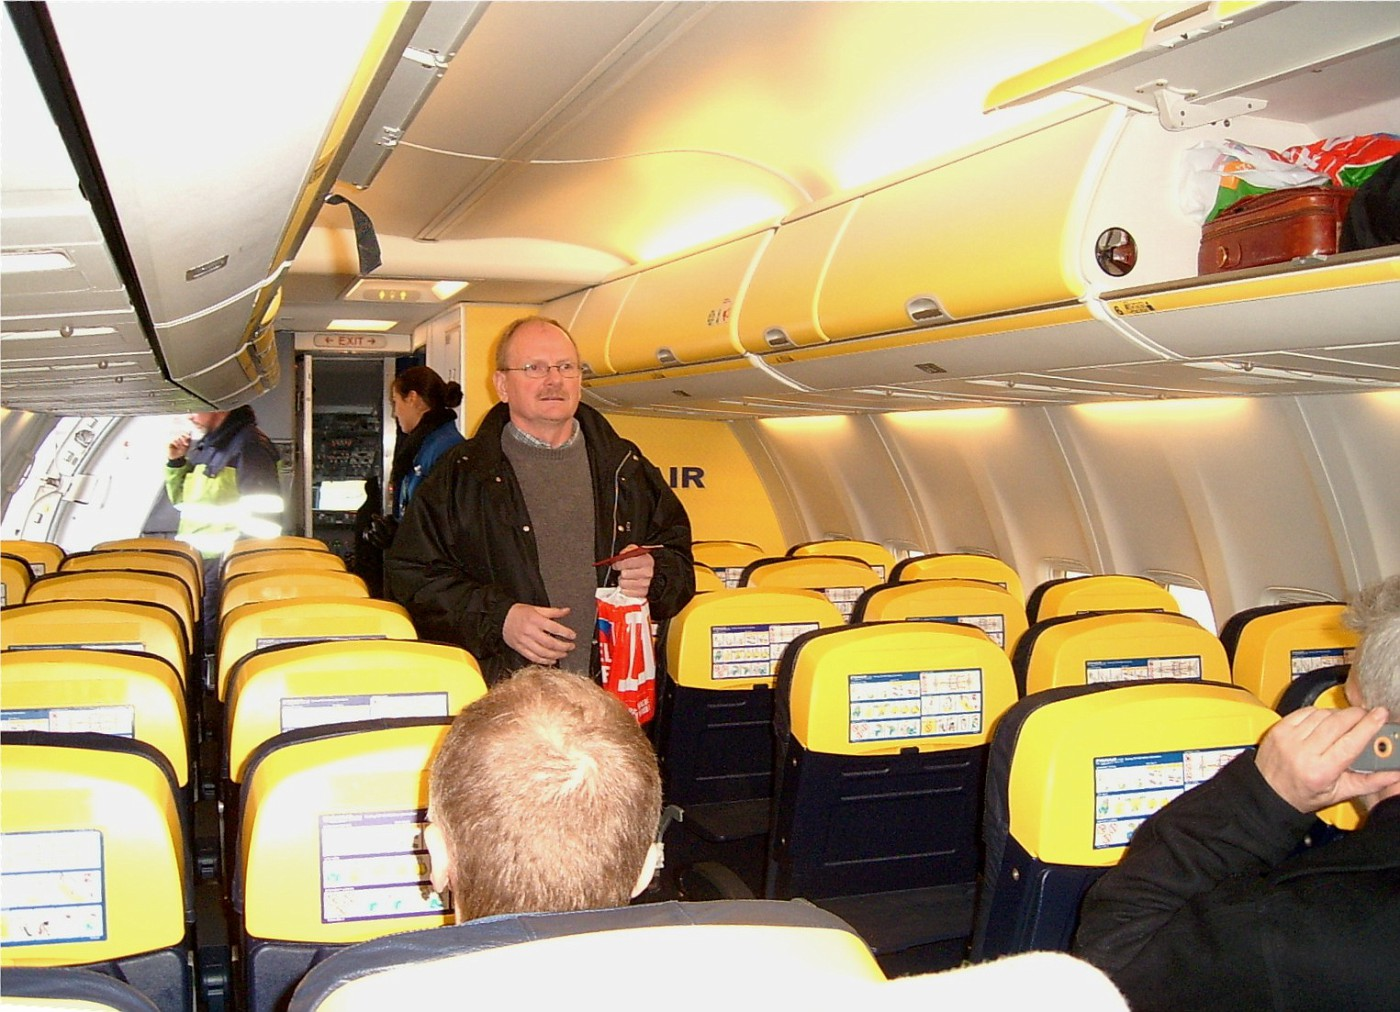 PIC 0210 Inside Ryanair plane